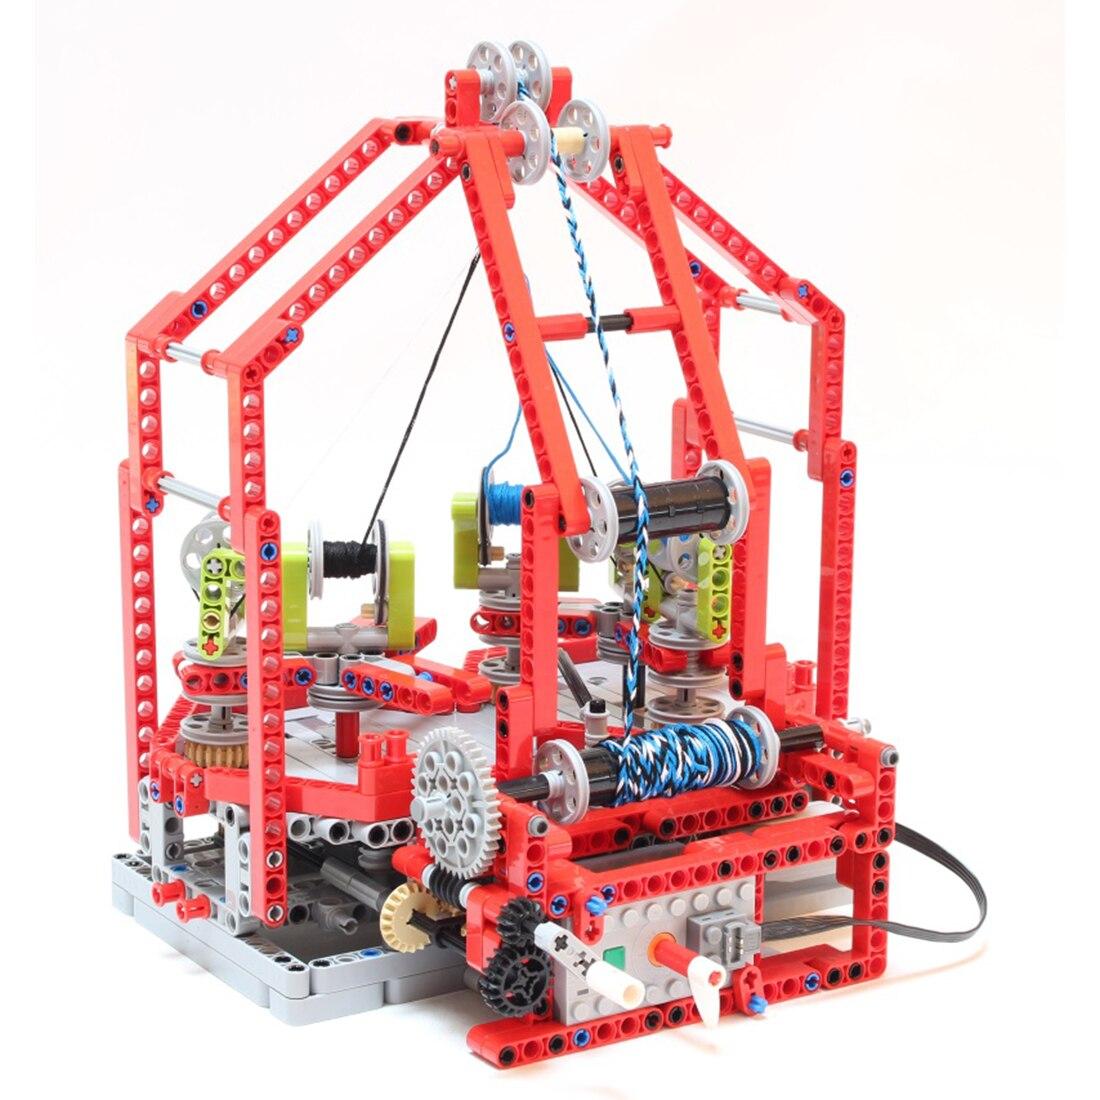 MODIKER 759Pcs Moc Technic Bricks Fast Braiding Machine City Roof Particle Building Blocks Programmable High Tech Toys